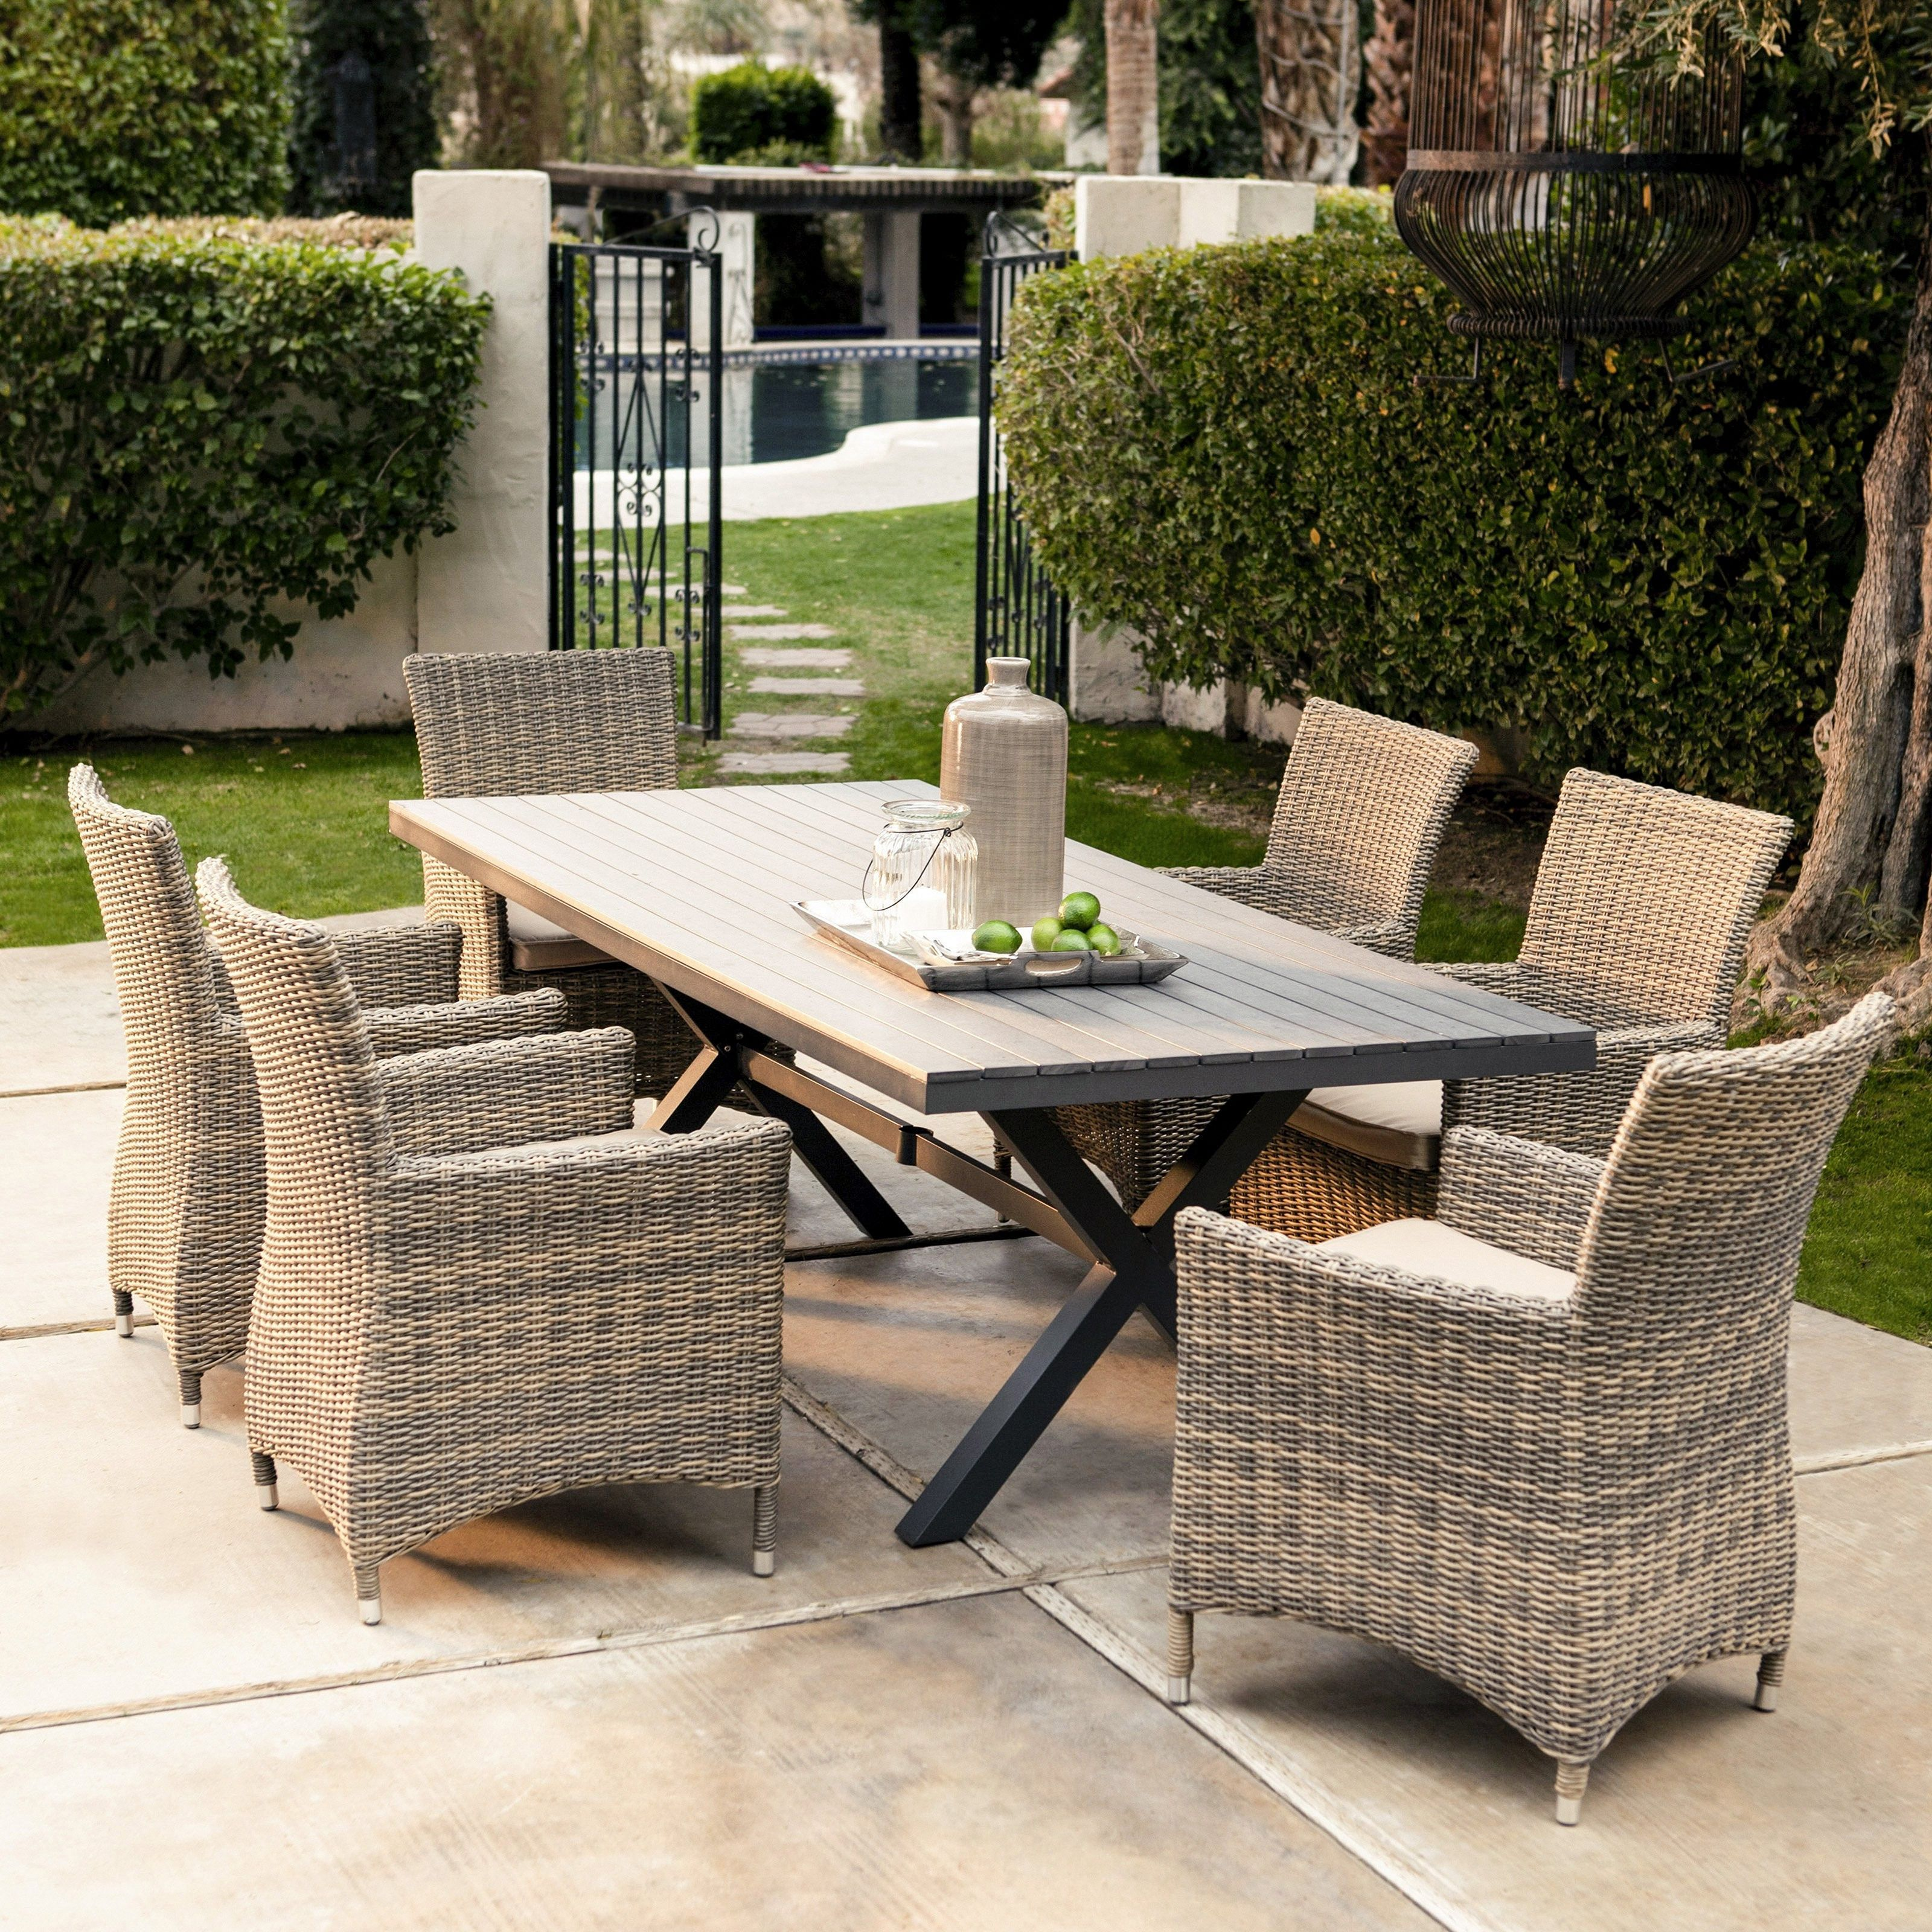 15 Minimalist Outdoor Patio Furniture Ideas That Will Make Backyard More Awesome Freshouz Com Clearance Patio Furniture Patio Dining Set Outdoor Dining Set